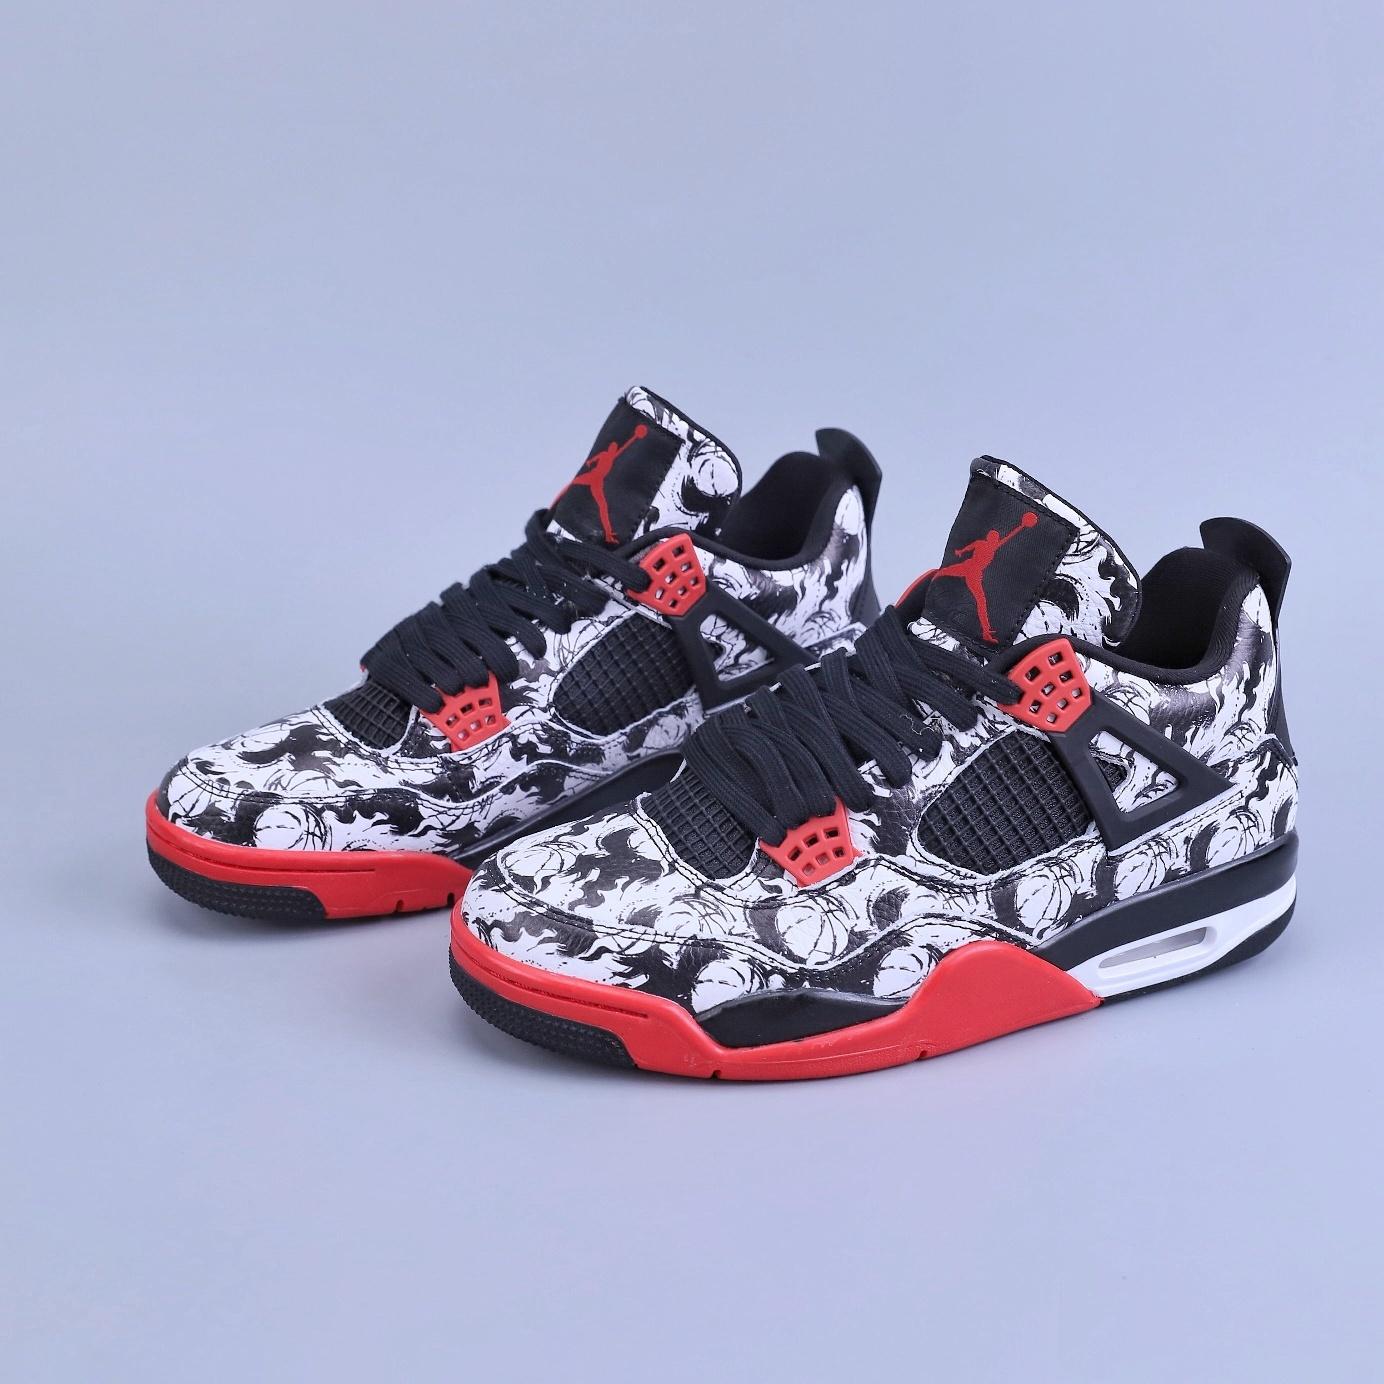 <b>AJ带纹身,谁都拦不住!Air Jordan 4 纹身涂鸦中国风开箱!</b>